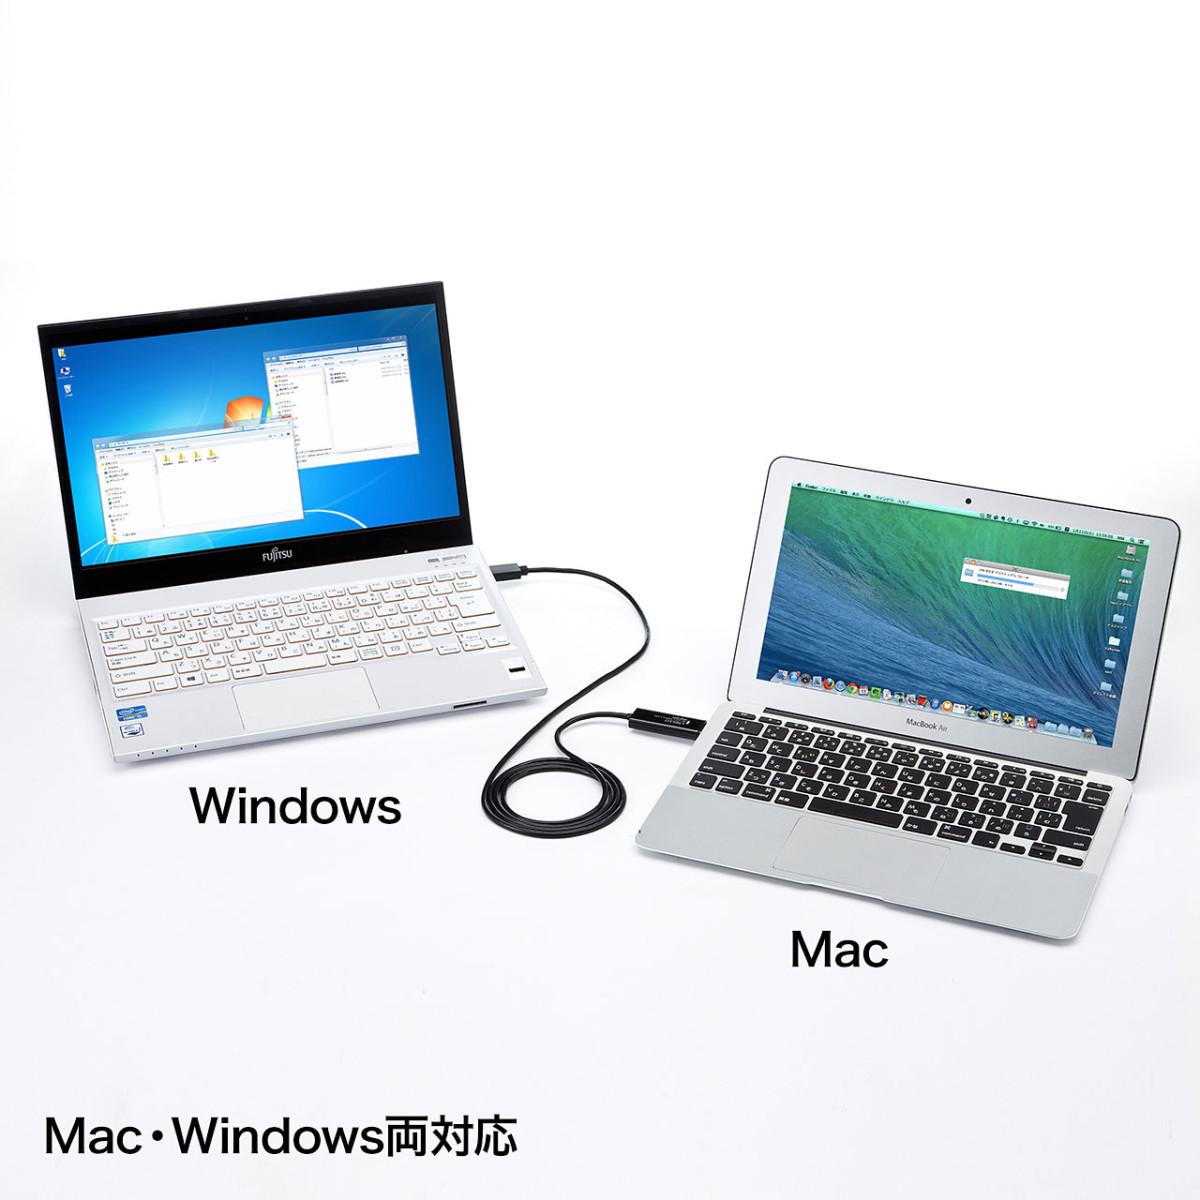 [KB-USB-LINK4] 【代引き不可】ドラッグ&ドロップ対応USB3.0リンクケーブル(Mac/Windows対応)